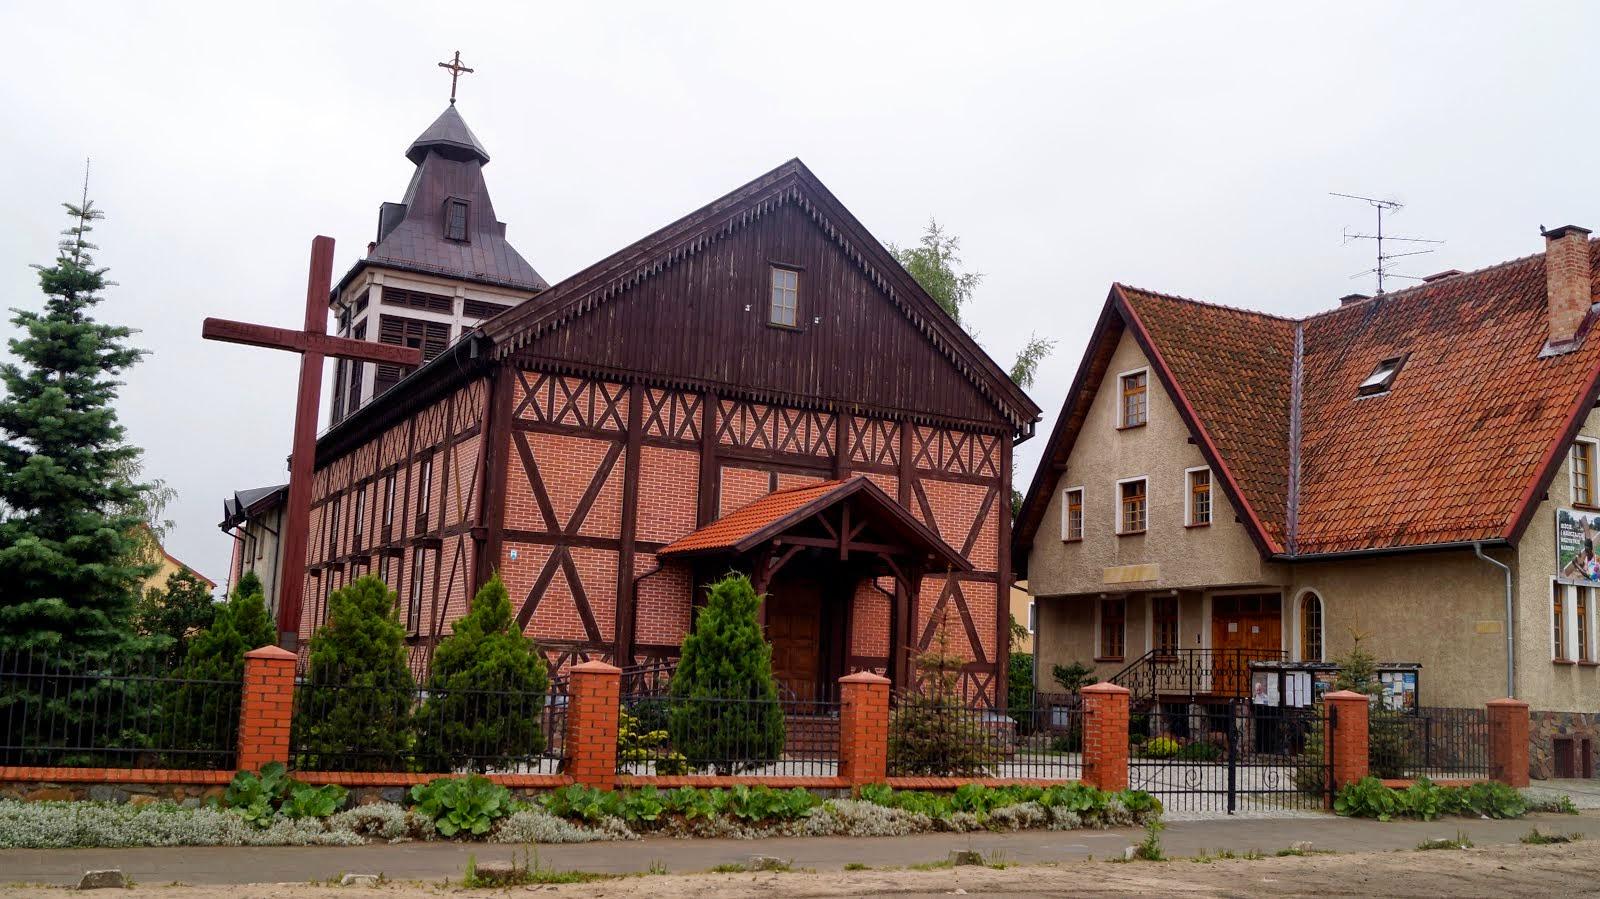 Nasza parafia i nasz kościół